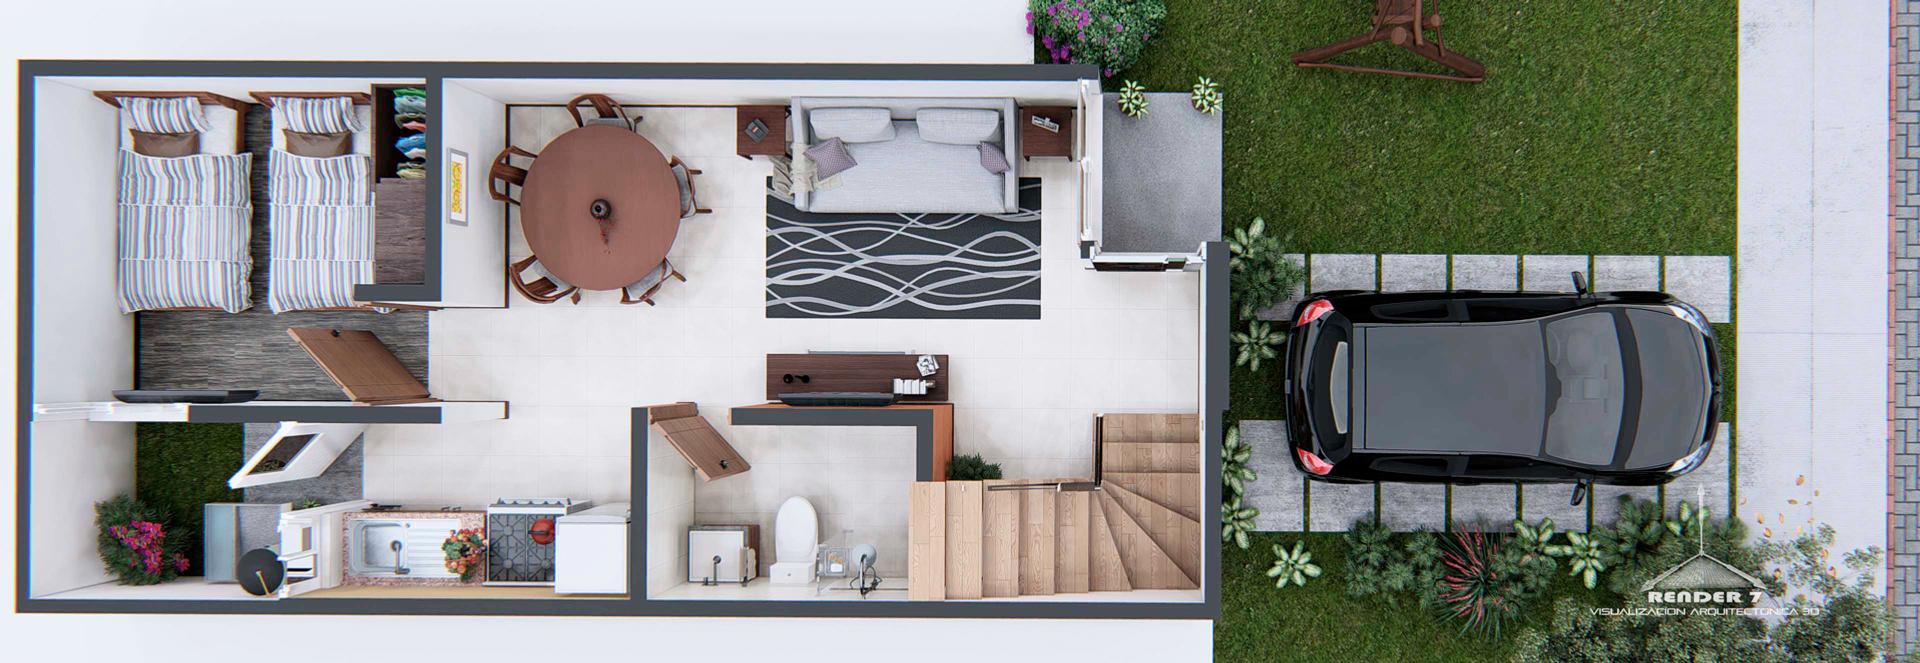 Planta-Baja-3D_Fresno